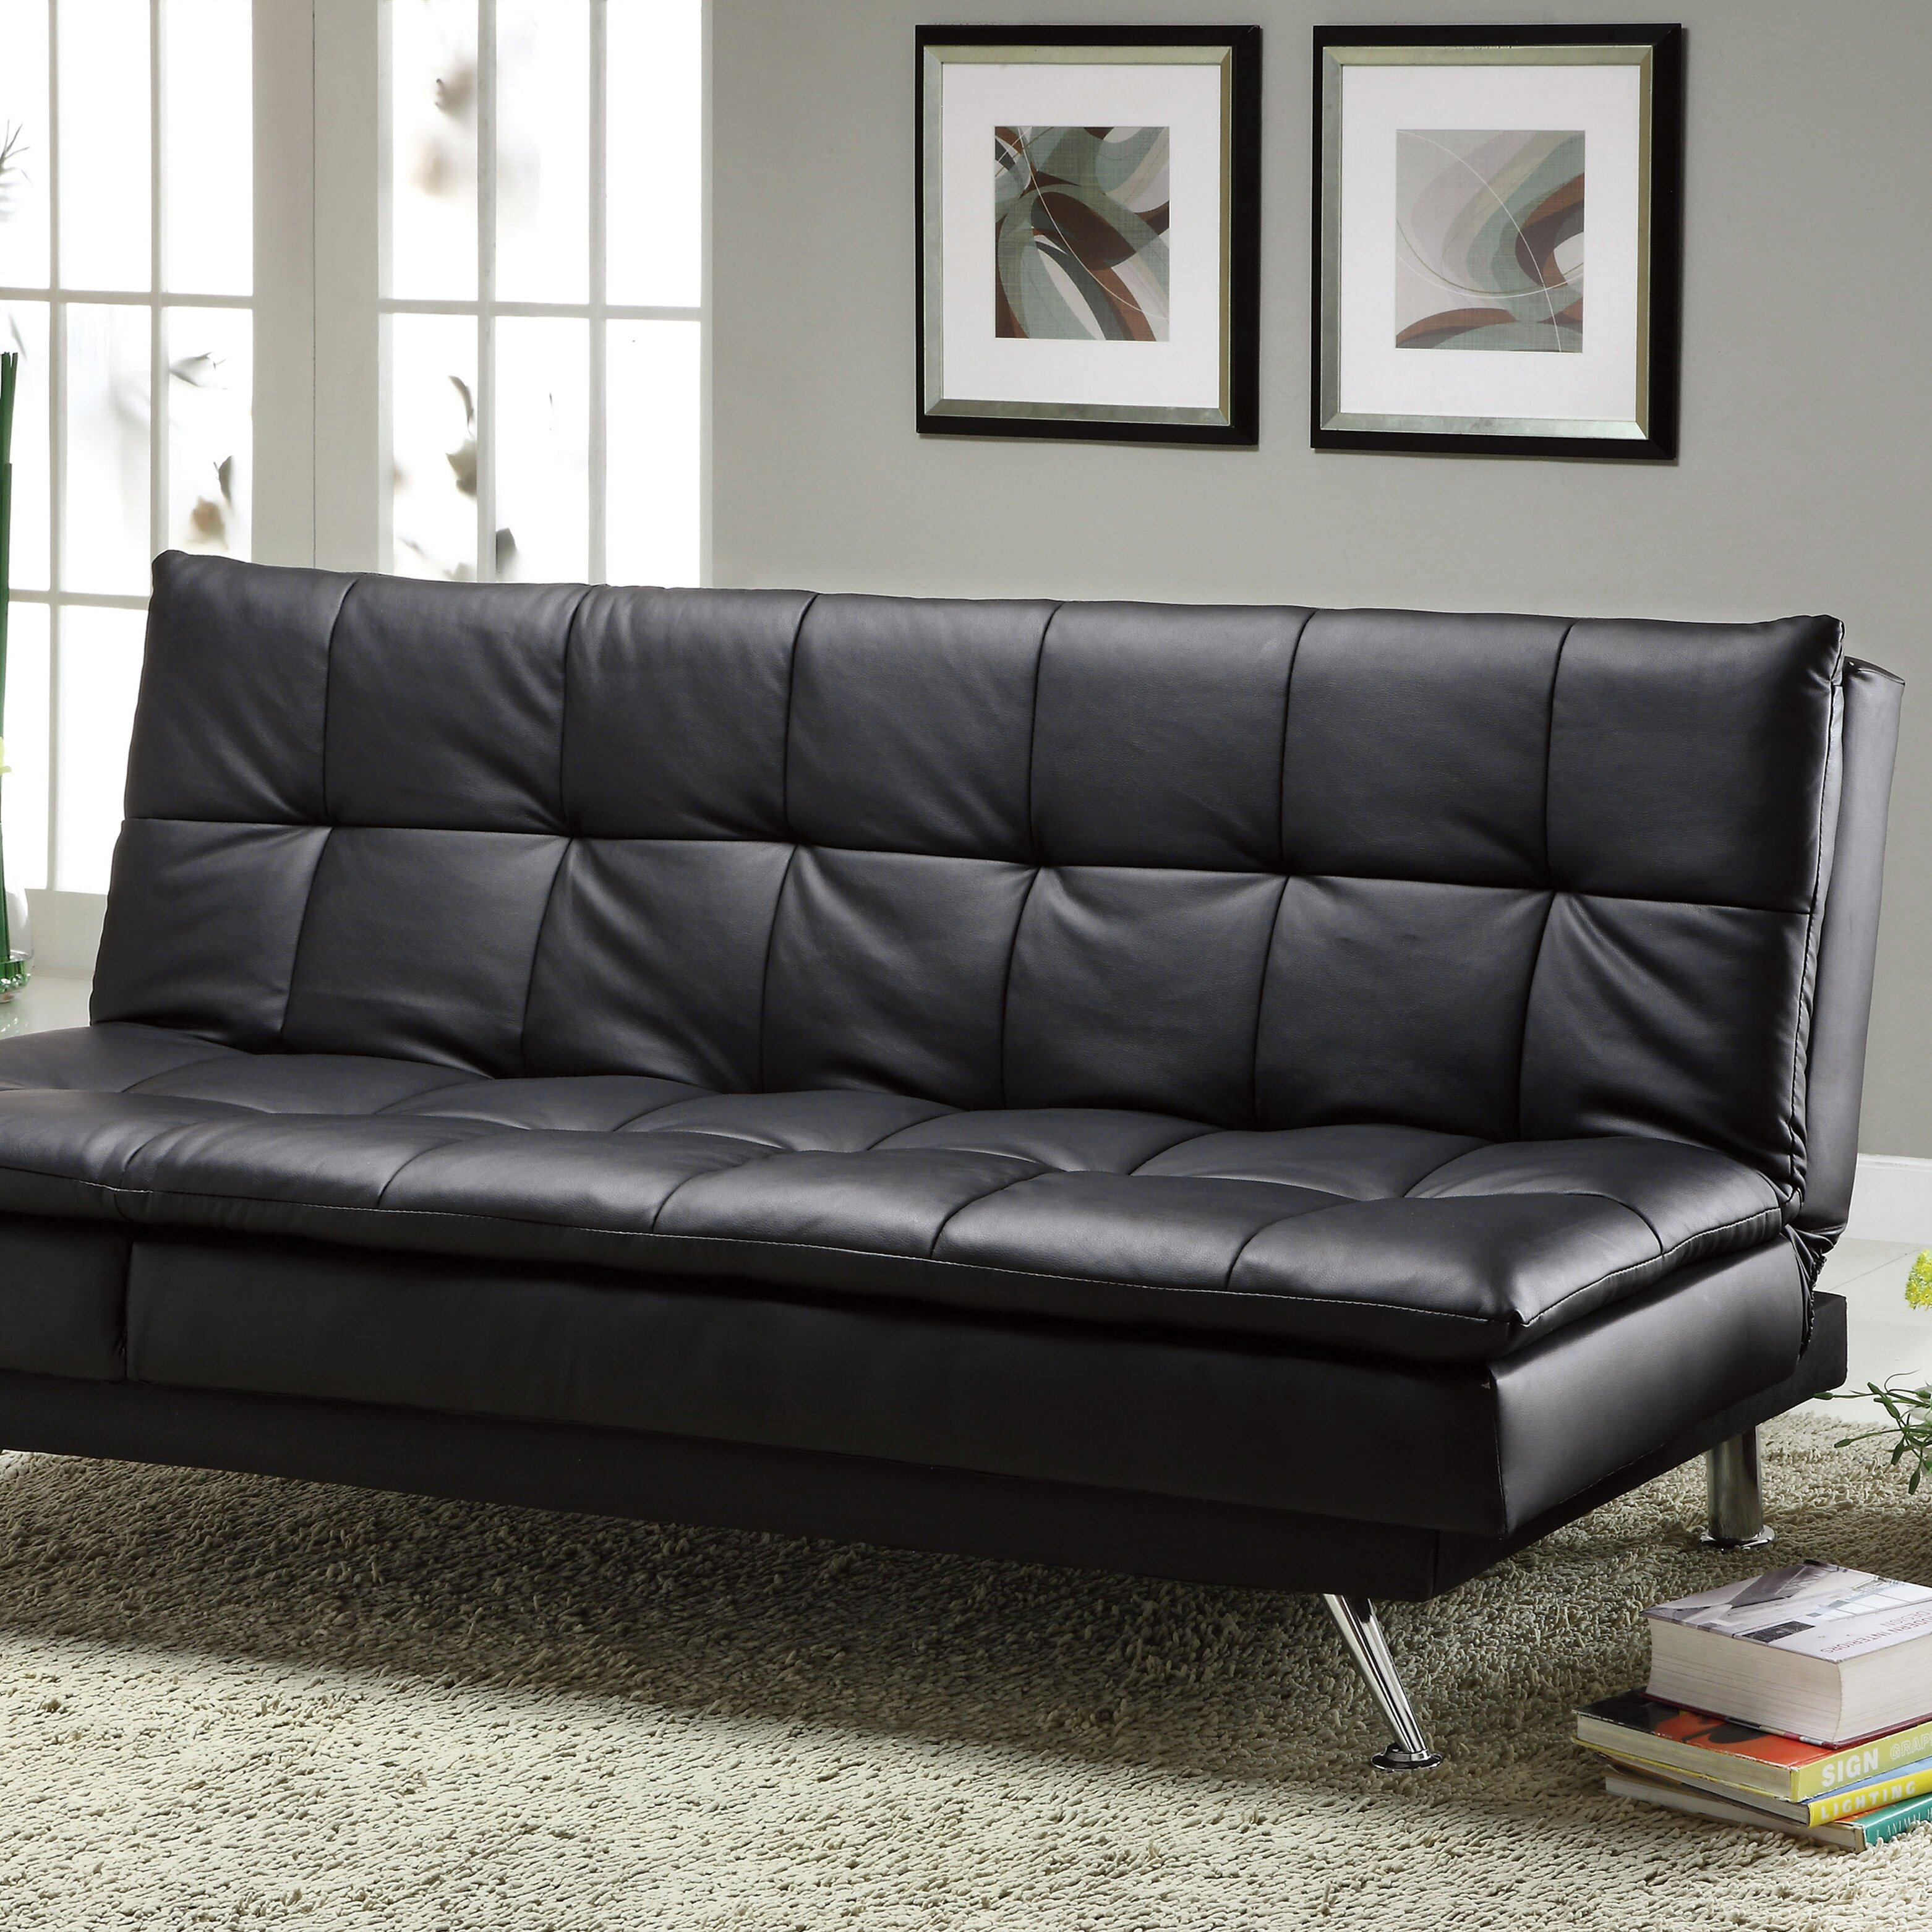 Latitude Run Black Faux Leather Sleeper Sofa Reviews